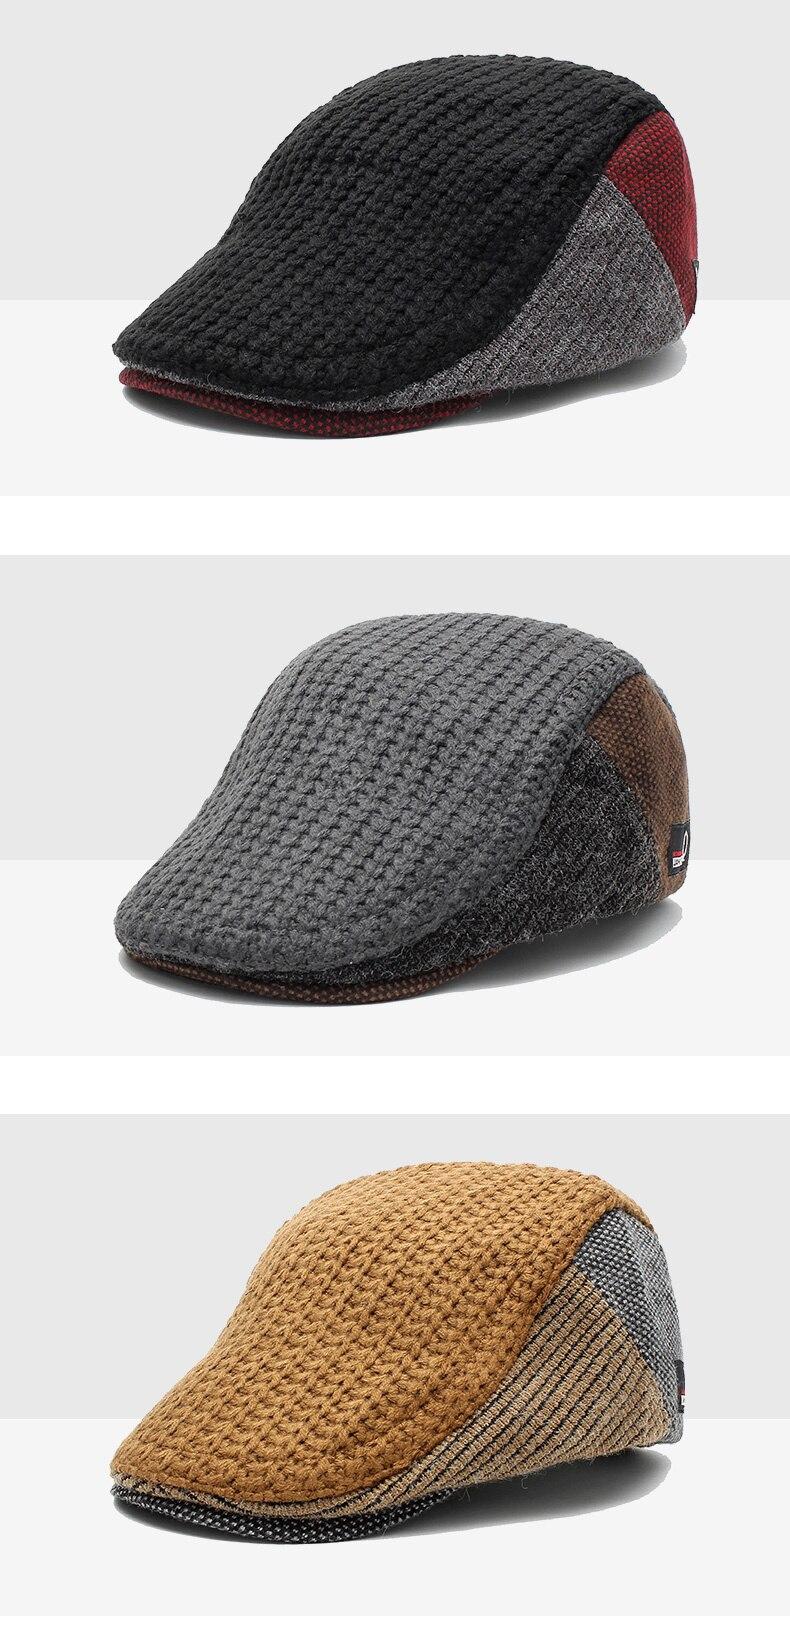 lã de malha chapéu masculino retro gatsby